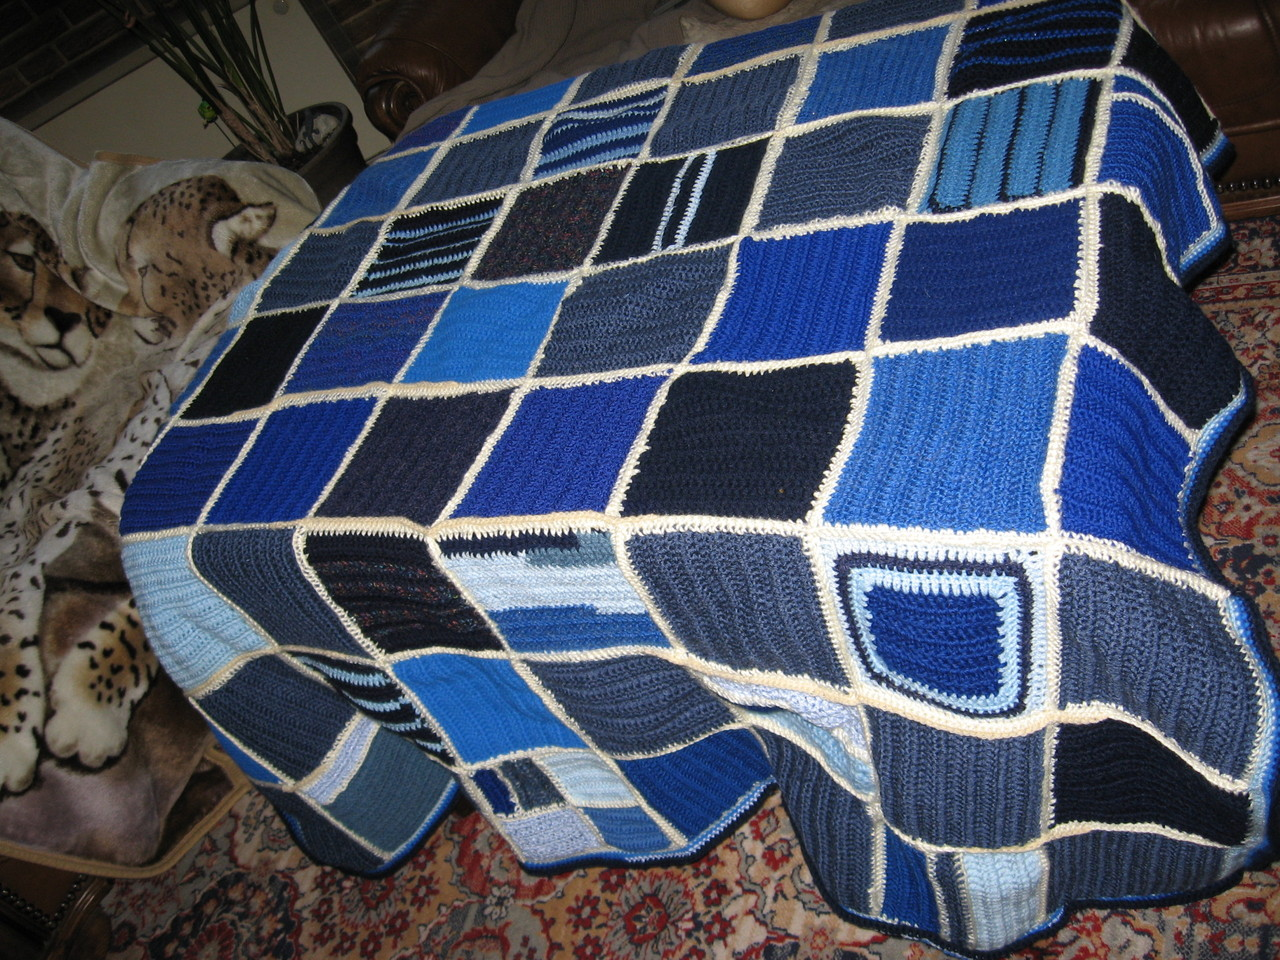 wolldecken iloona hat 1000 strickideens webseite. Black Bedroom Furniture Sets. Home Design Ideas